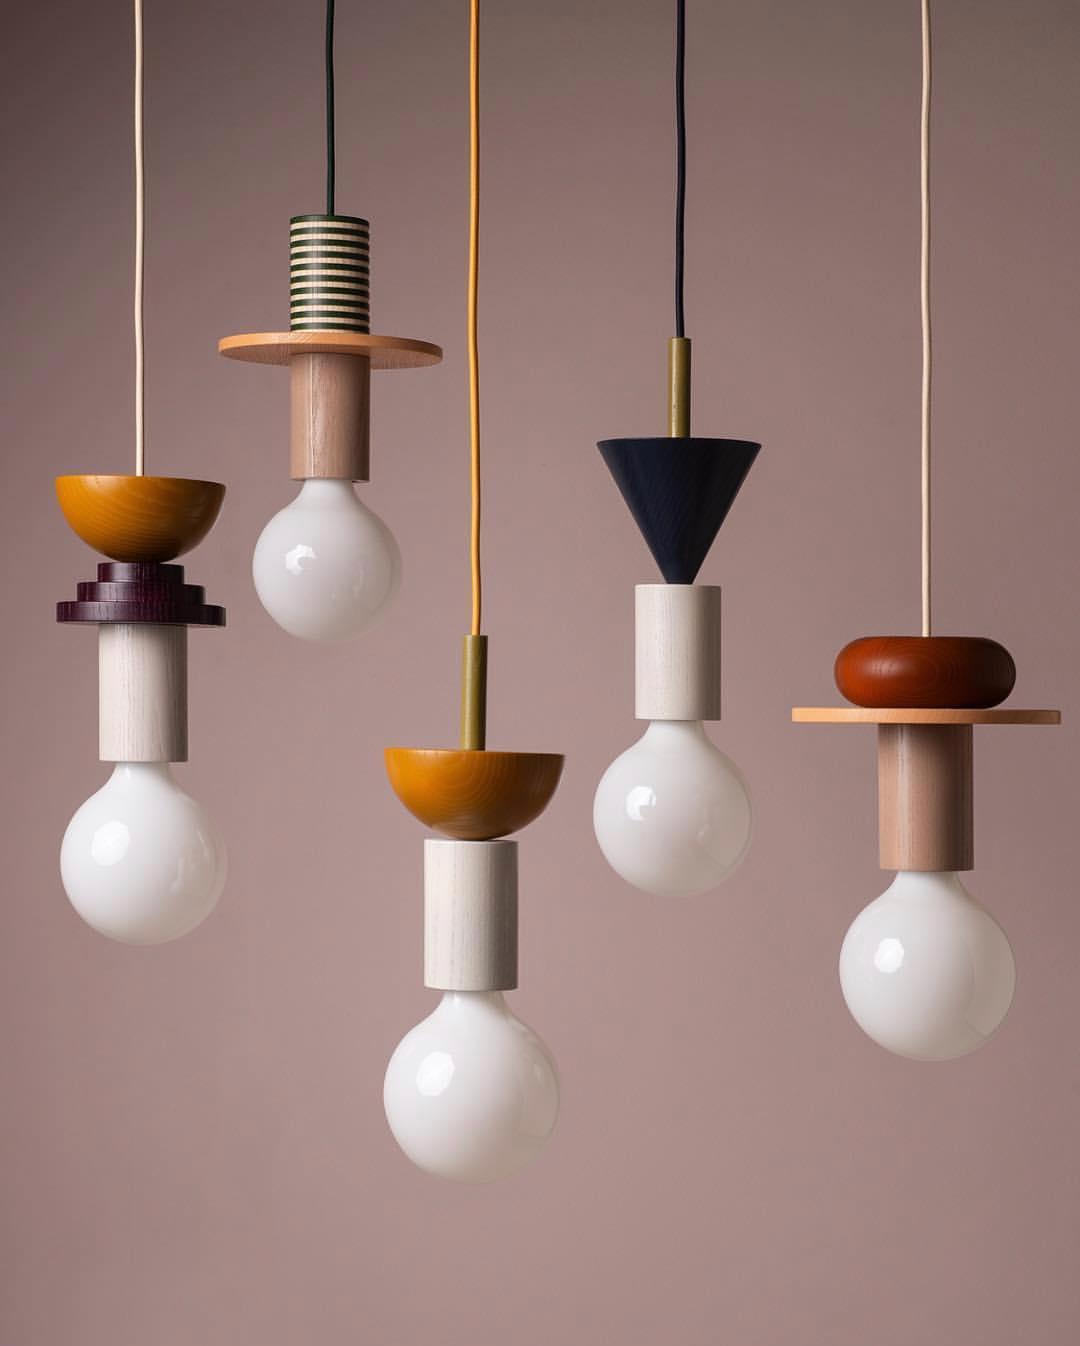 دکوراسیون لامپ های روشنایی